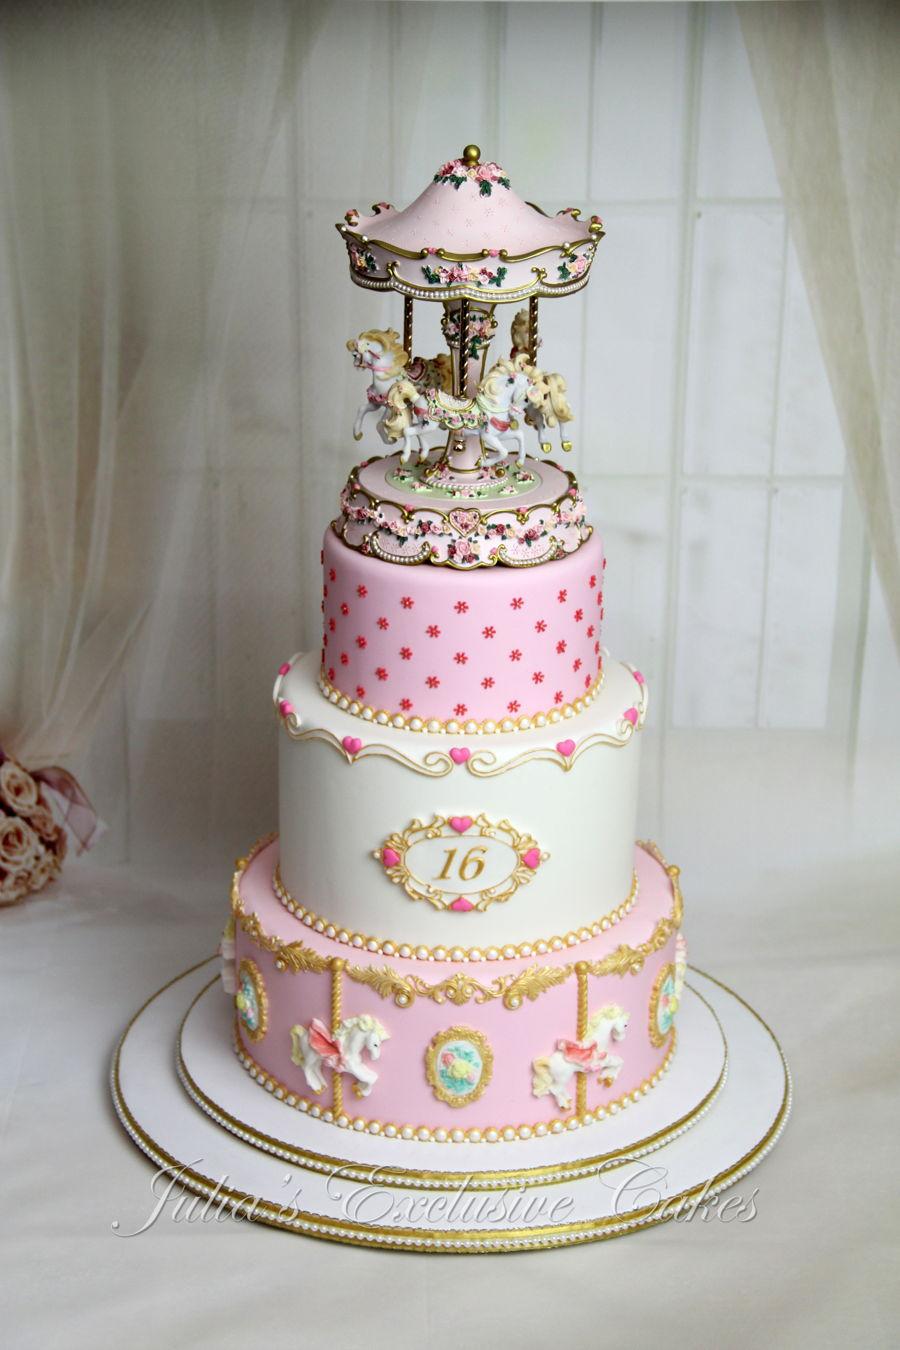 Carousel Music Box Cake Cakecentral Com